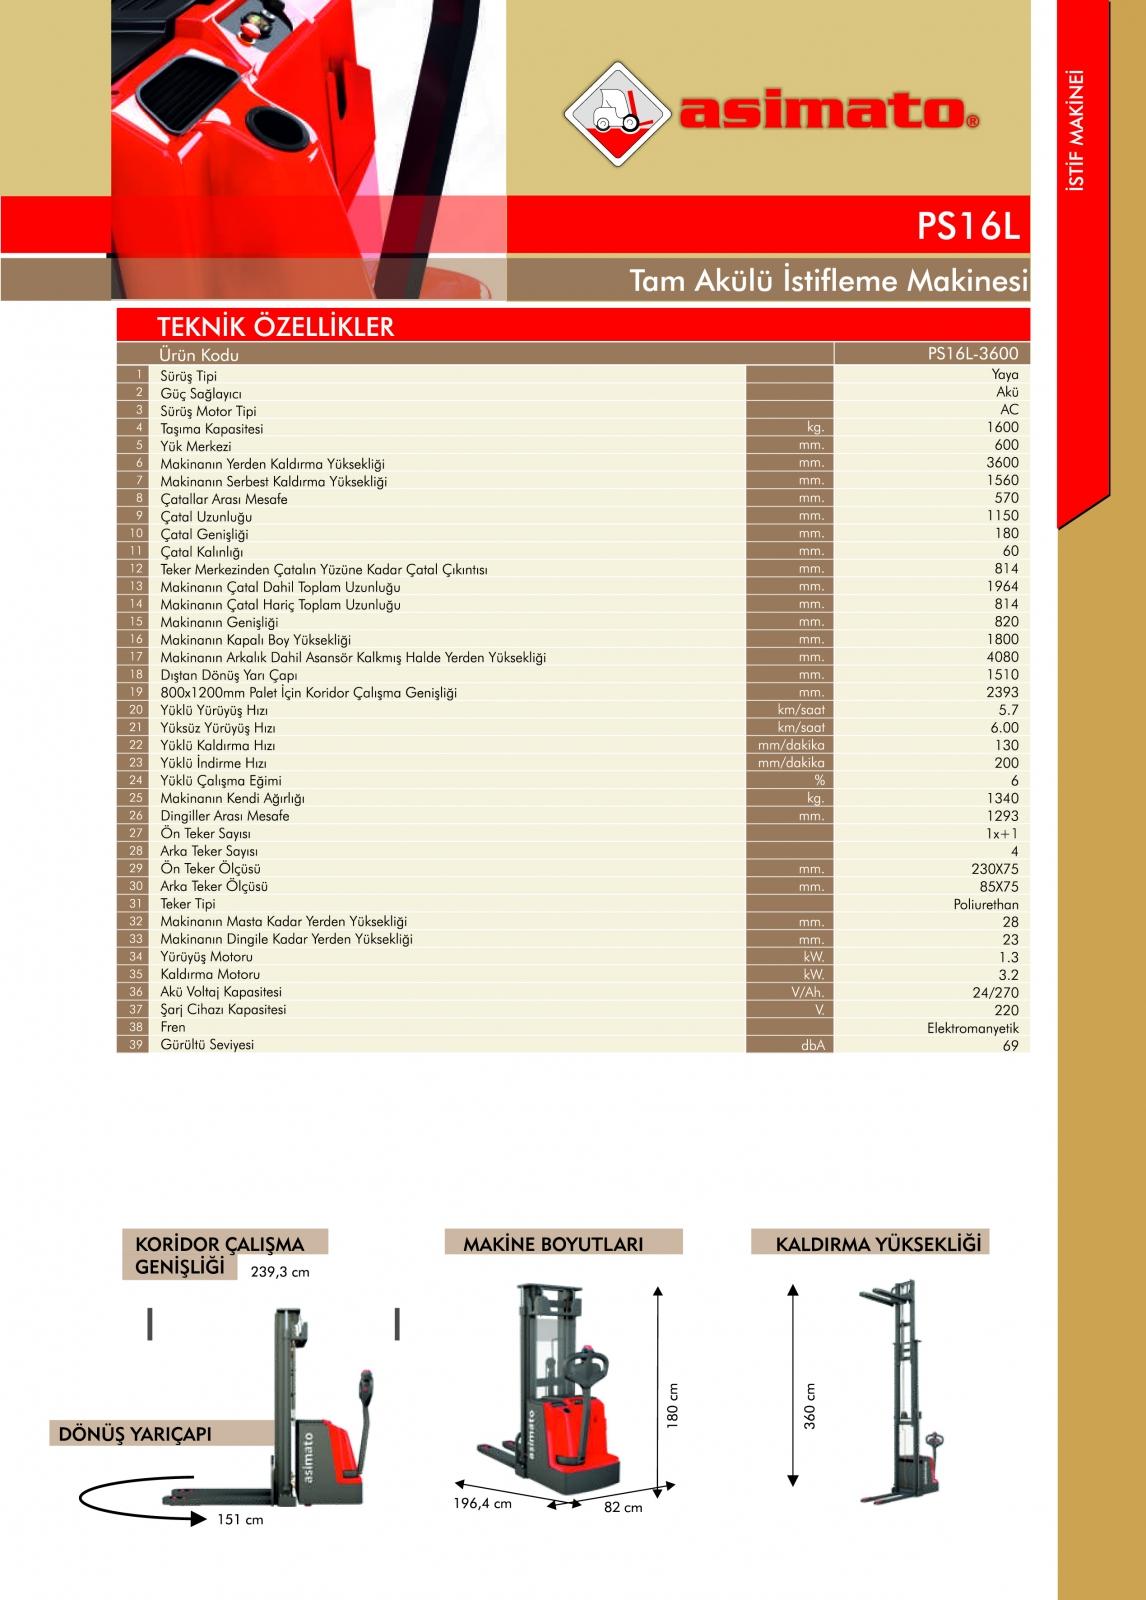 PS16LFFL SERİSİ 1.6 TON 3.6 METRE TAM AKÜLÜ İSTİF MAKİNESİ